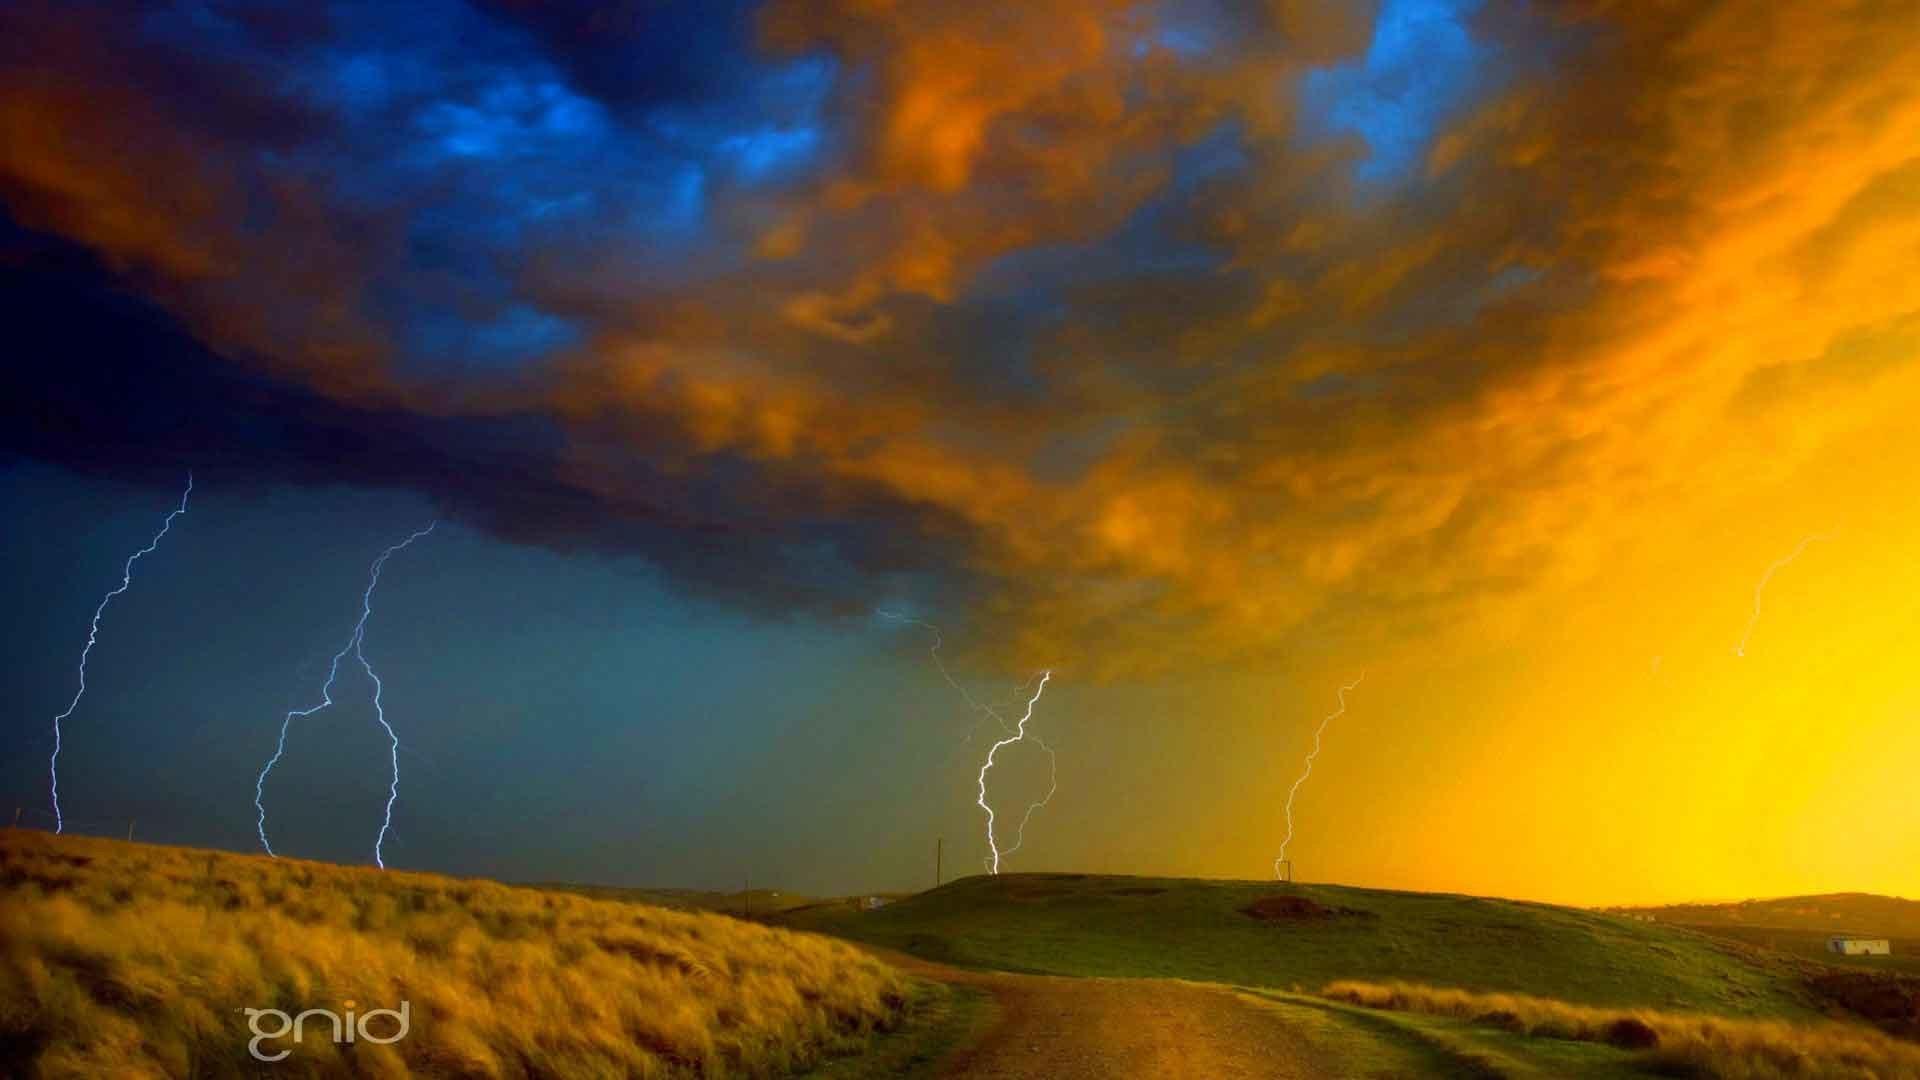 Sky Rain Thunderstorm Storm Nature Clouds Lightning 3D .